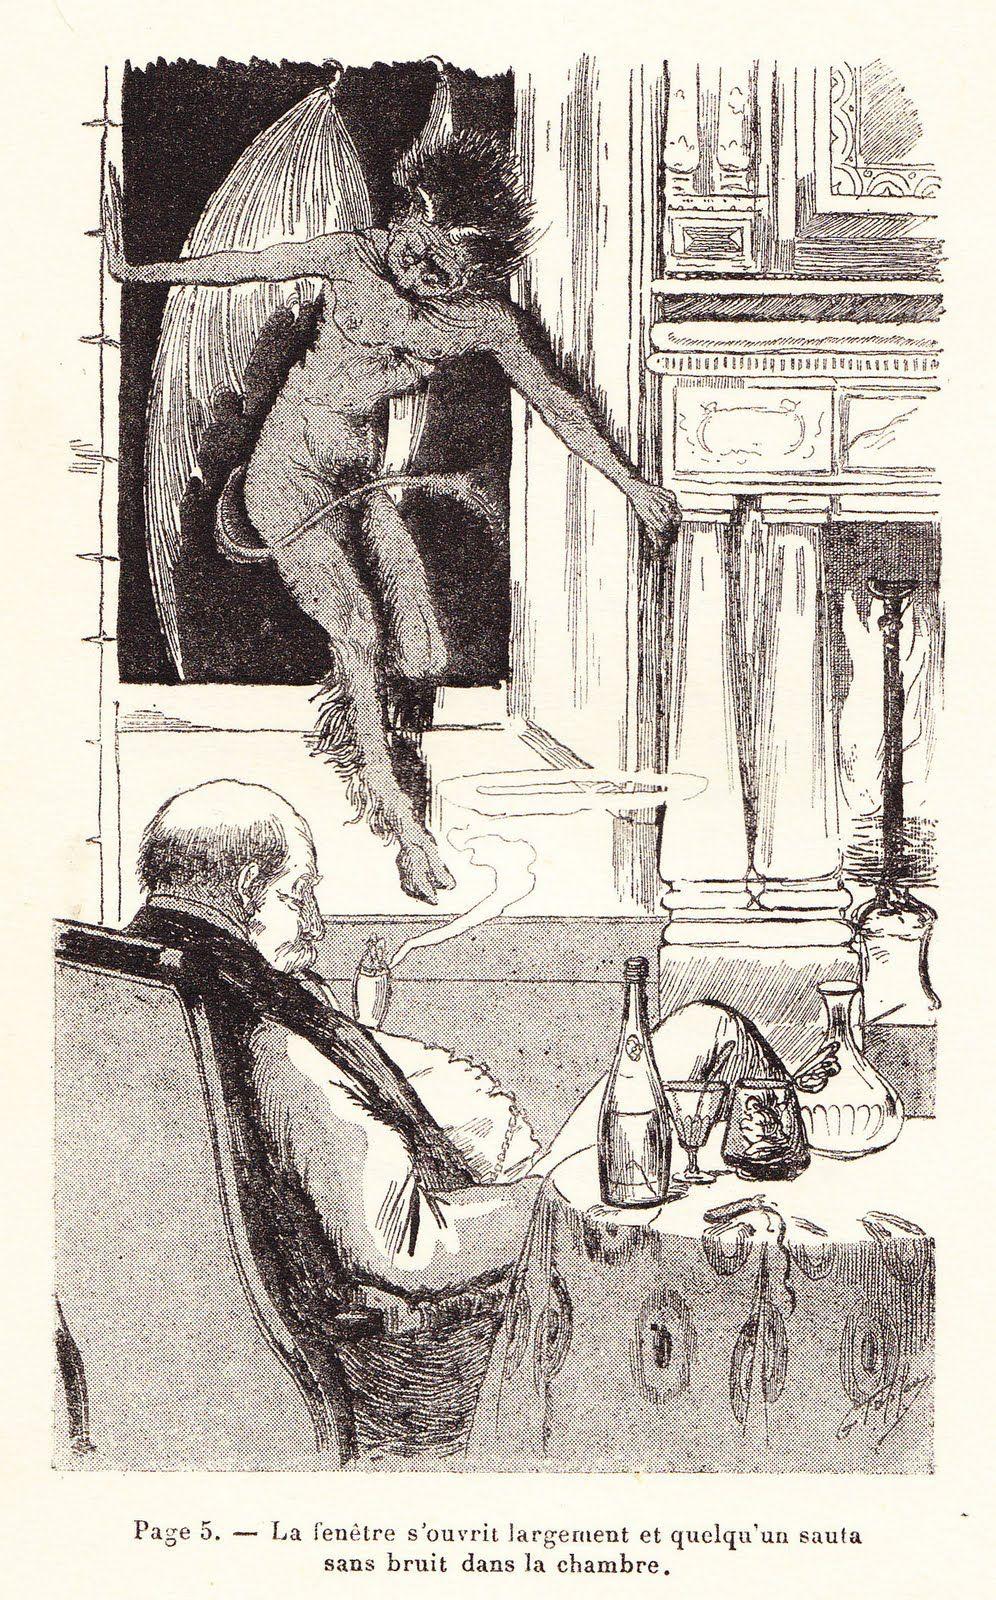 I MIEI SOGNI D'ANARCHIA - Calabria Anarchica: Georges Töpfer (no livedates) Illustrator